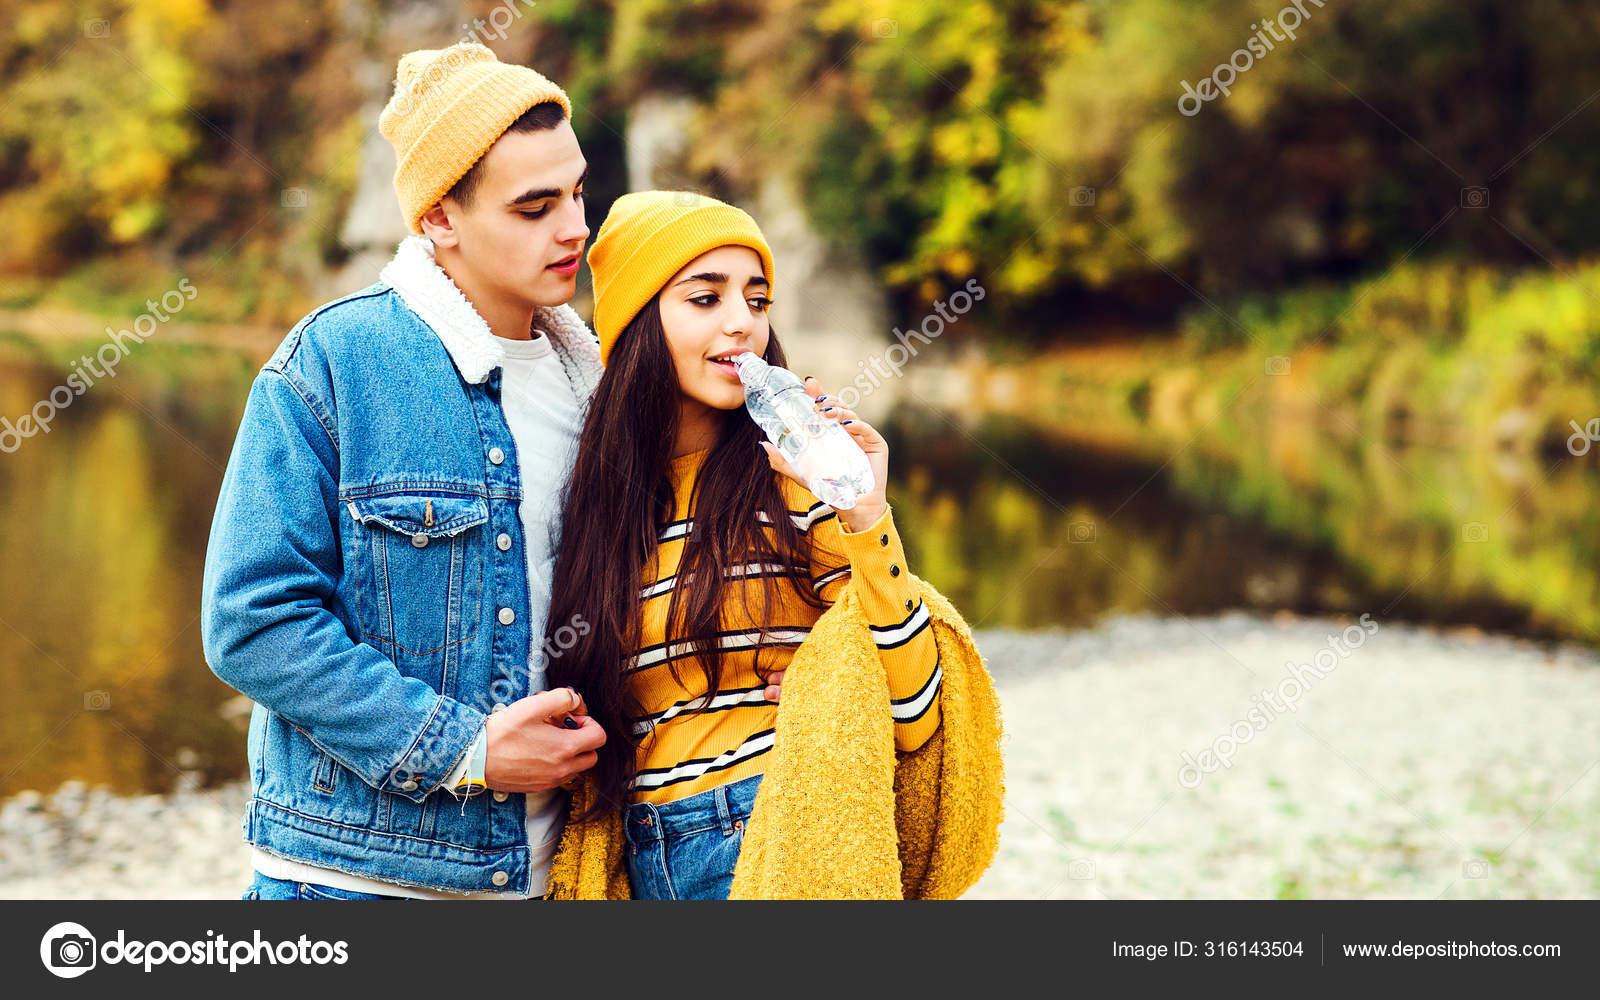 https://st4.depositphotos.com/8186610/31614/i/1600/depositphotos_316143504-stock-photo-young-couple-in-love-on.jpg